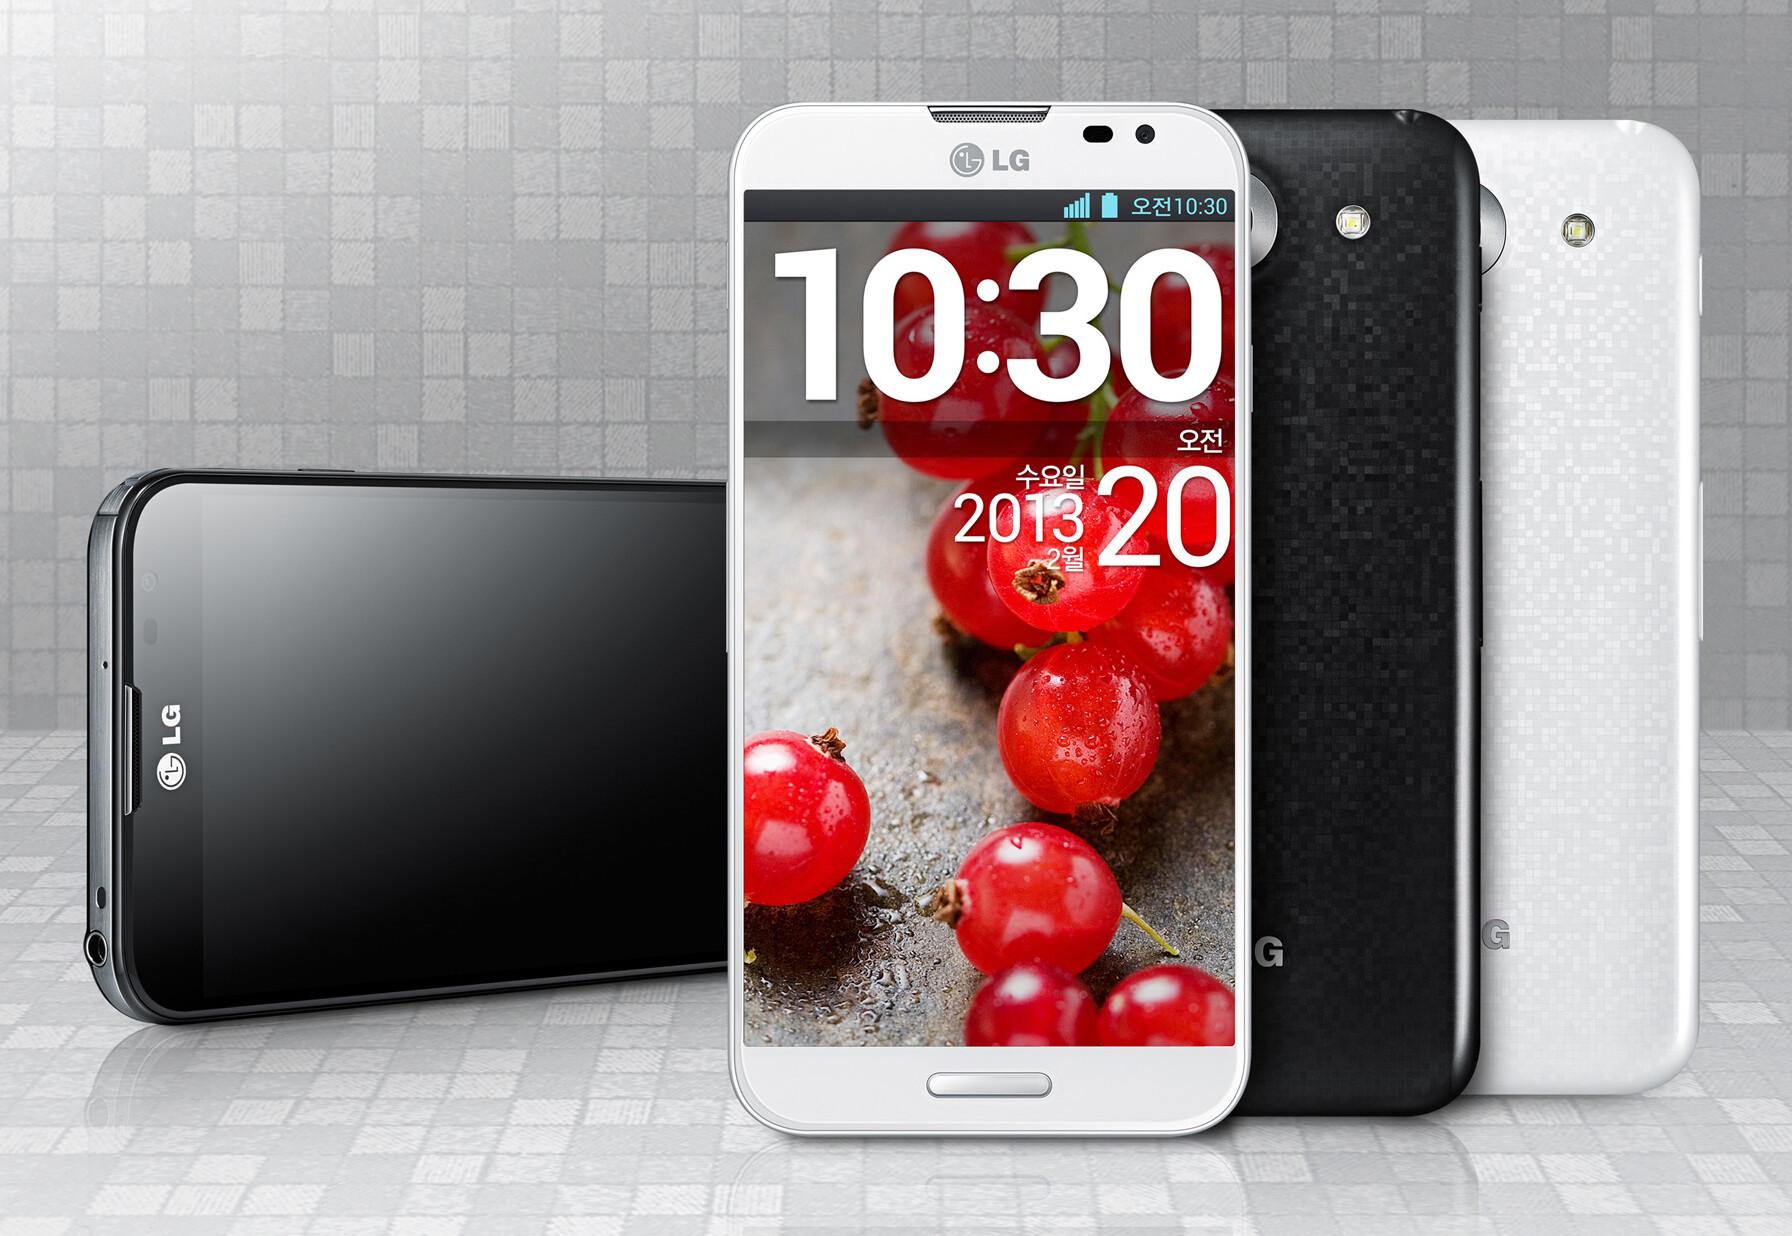 LG G Pro 2 Camera